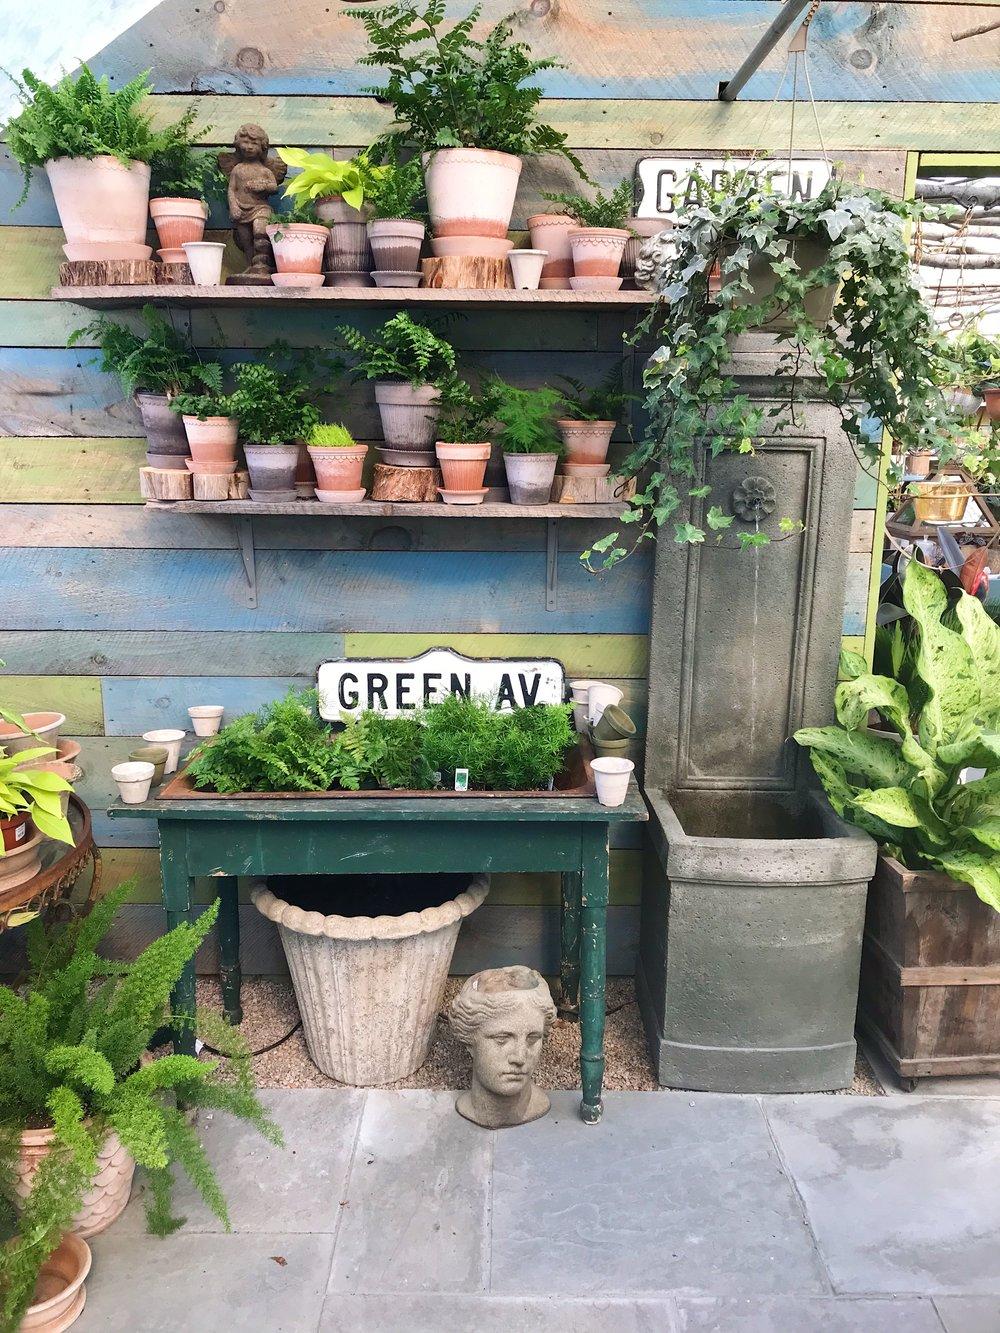 Photo courtesy of Patty J and PattyJ.com